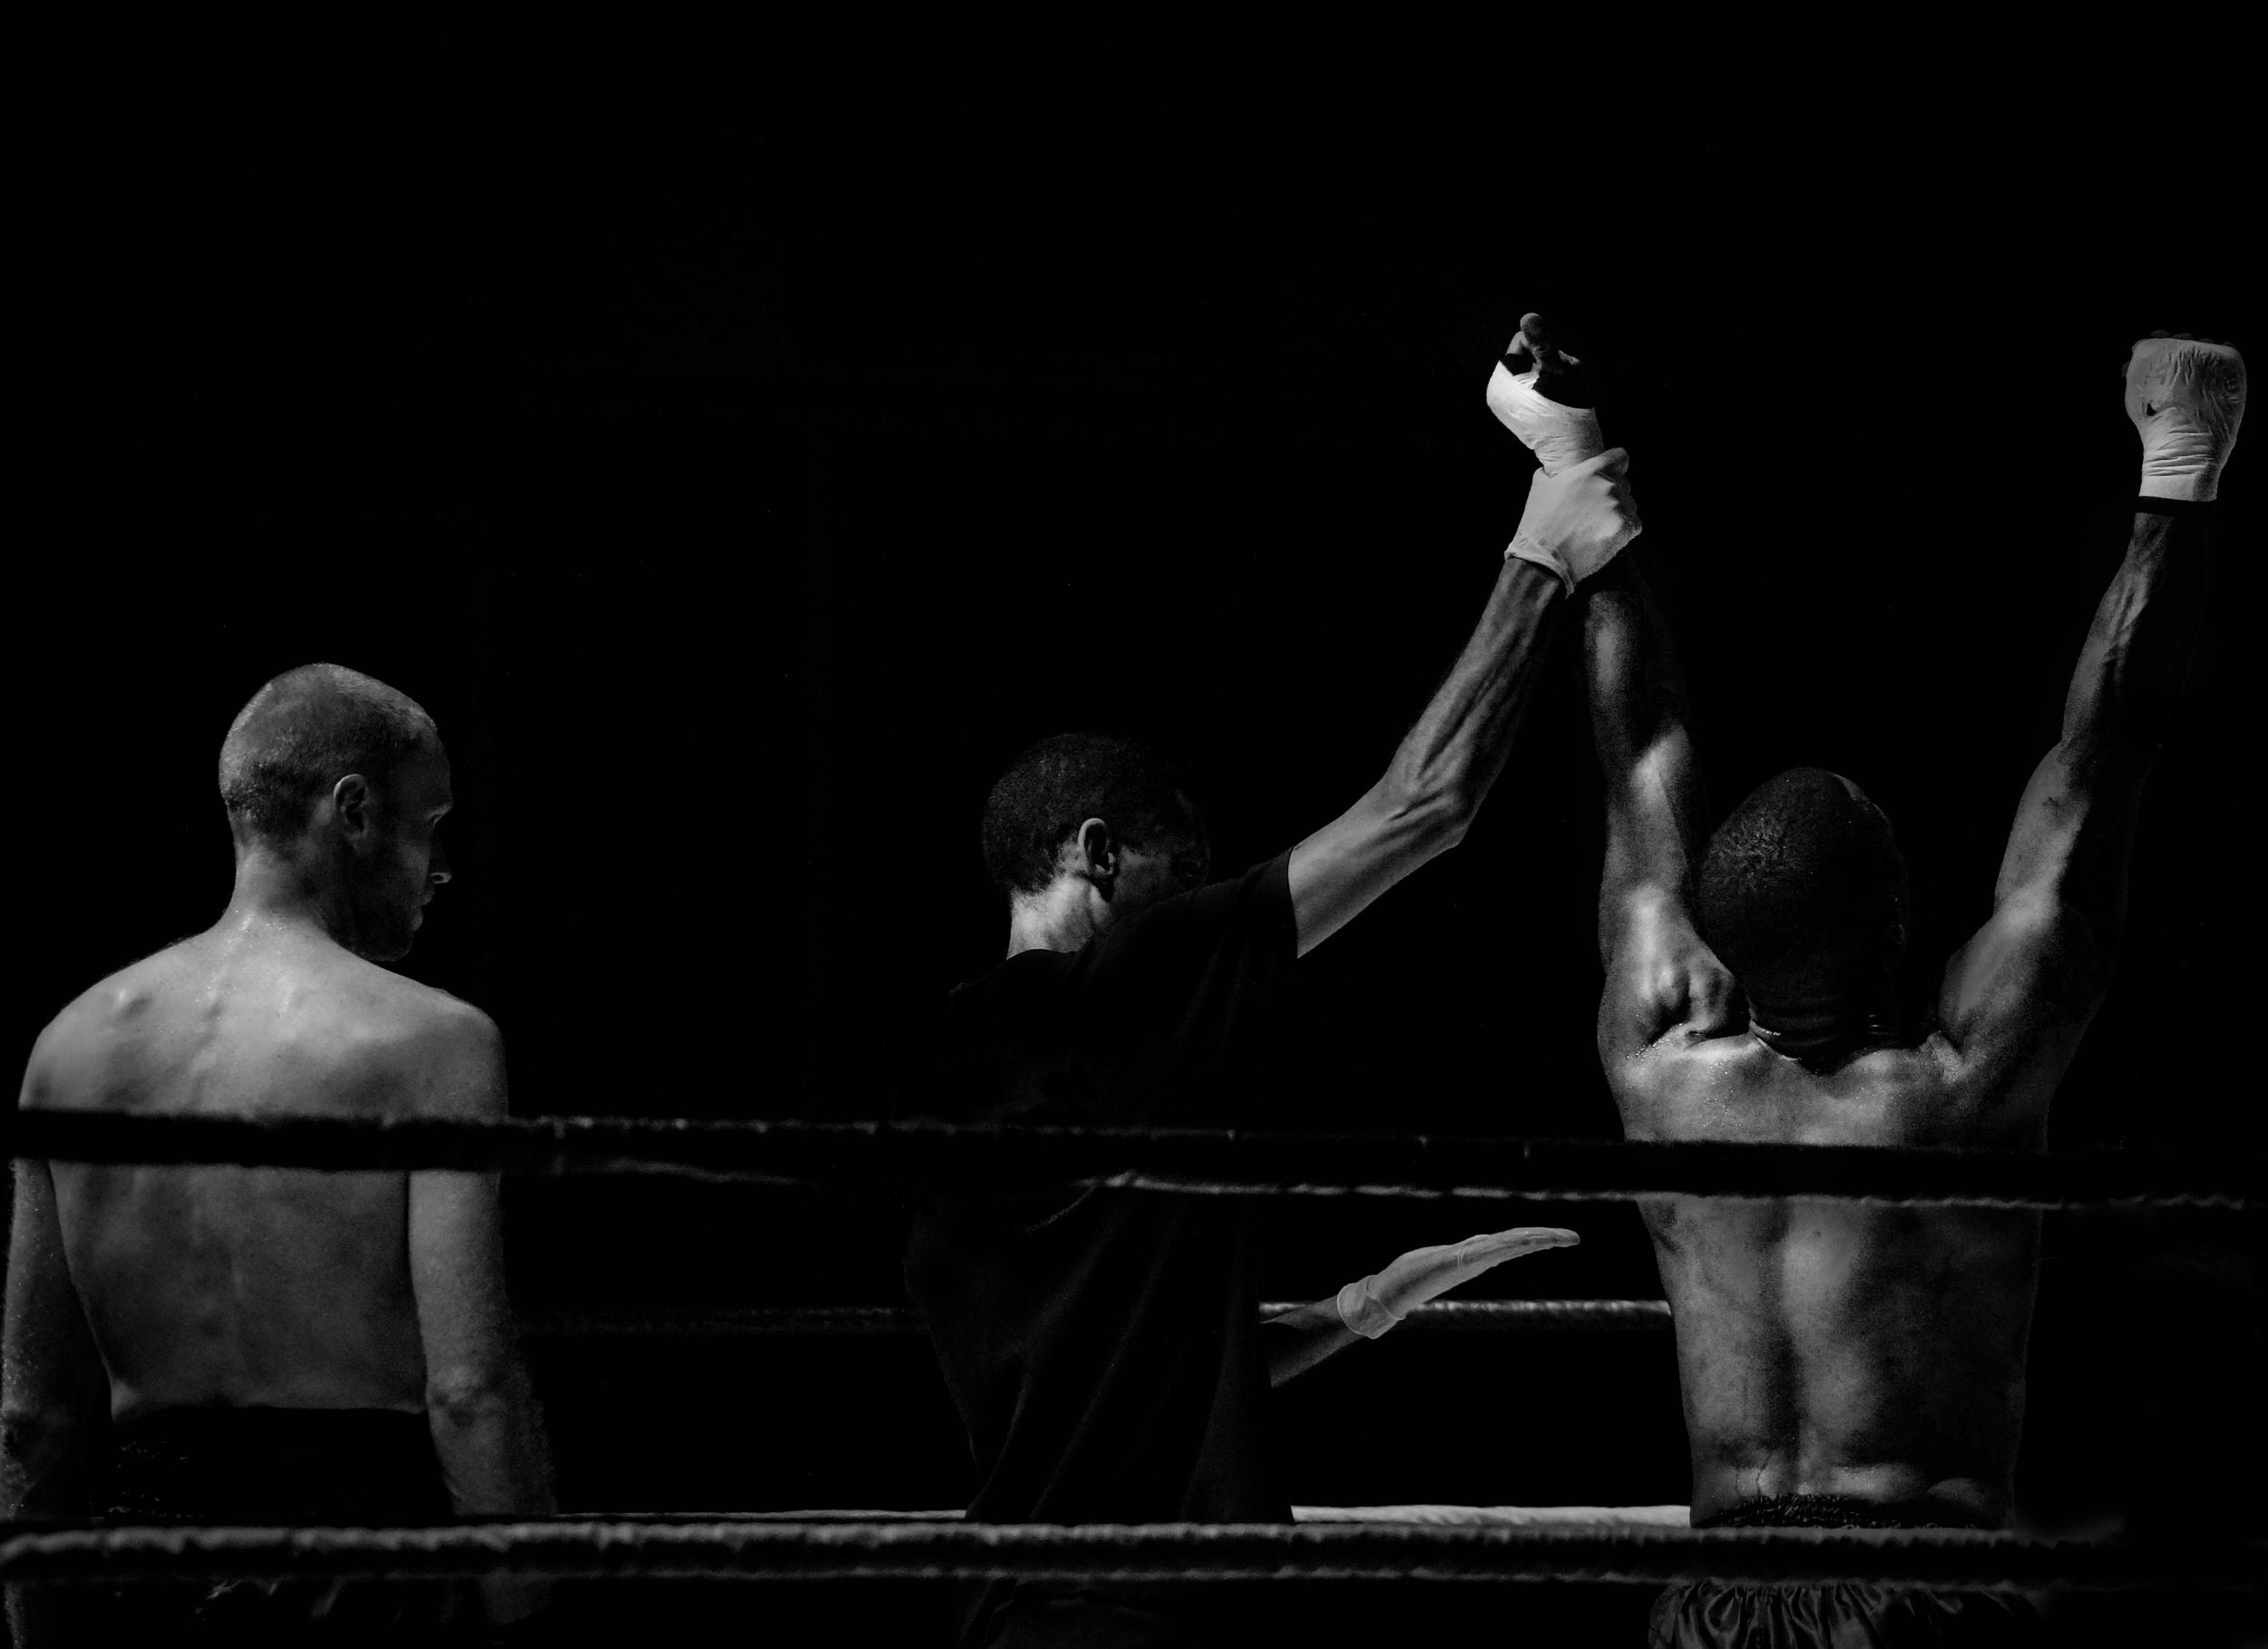 Victorious boxer having his arm raised